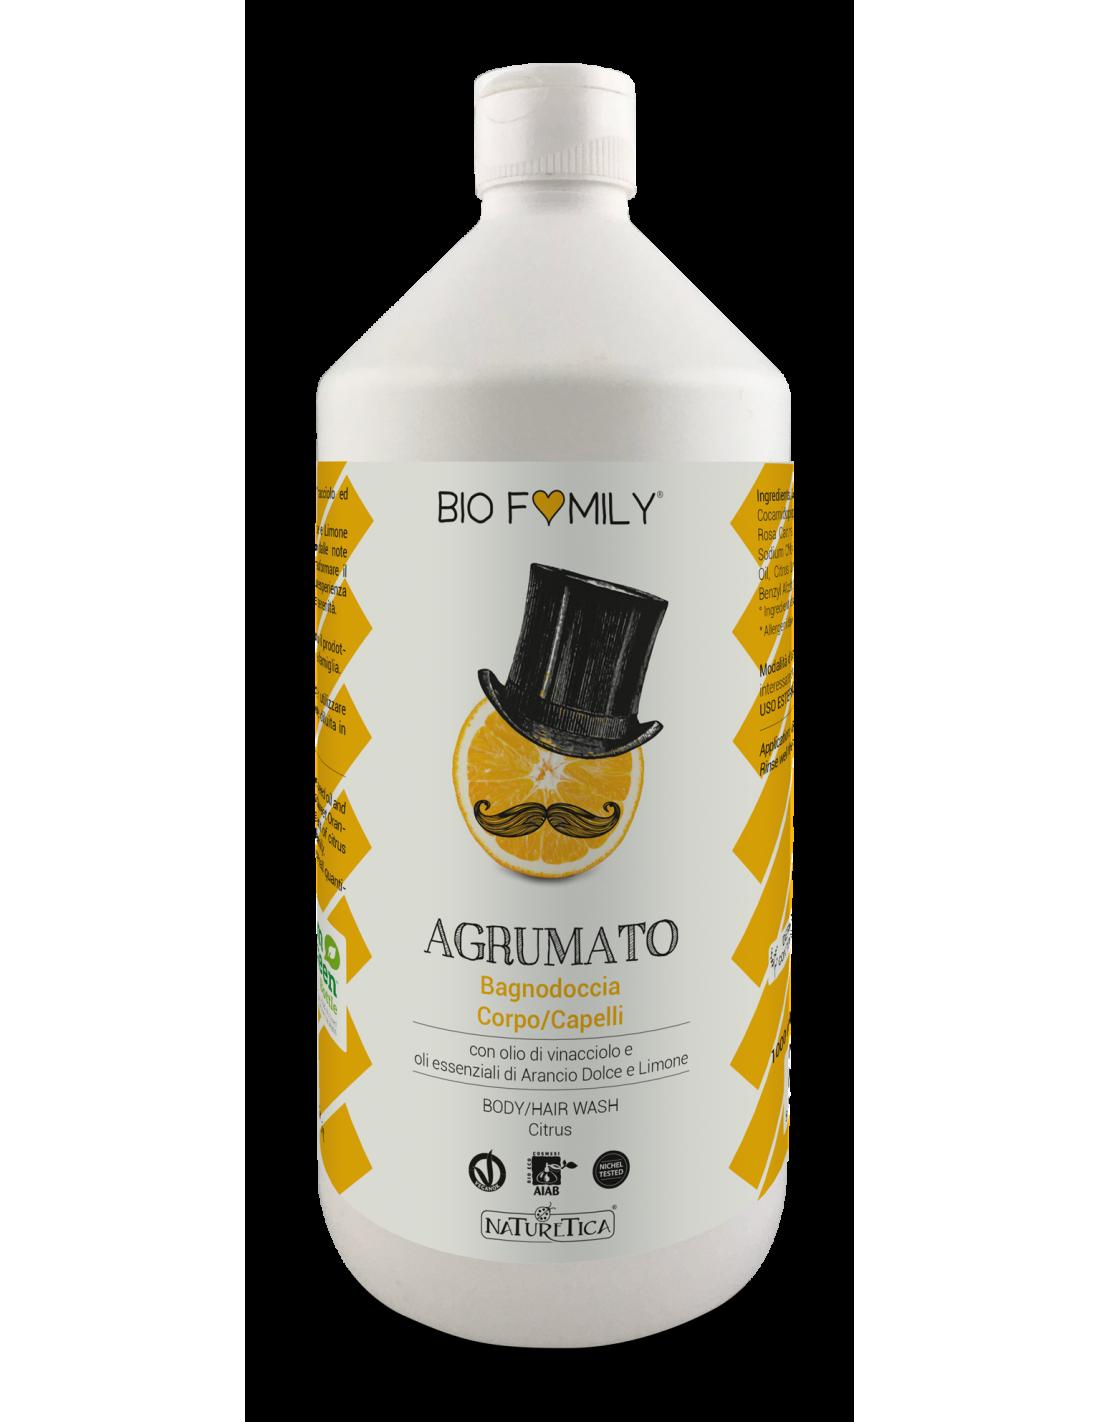 BioFamily Bagnodoccia Agrumato